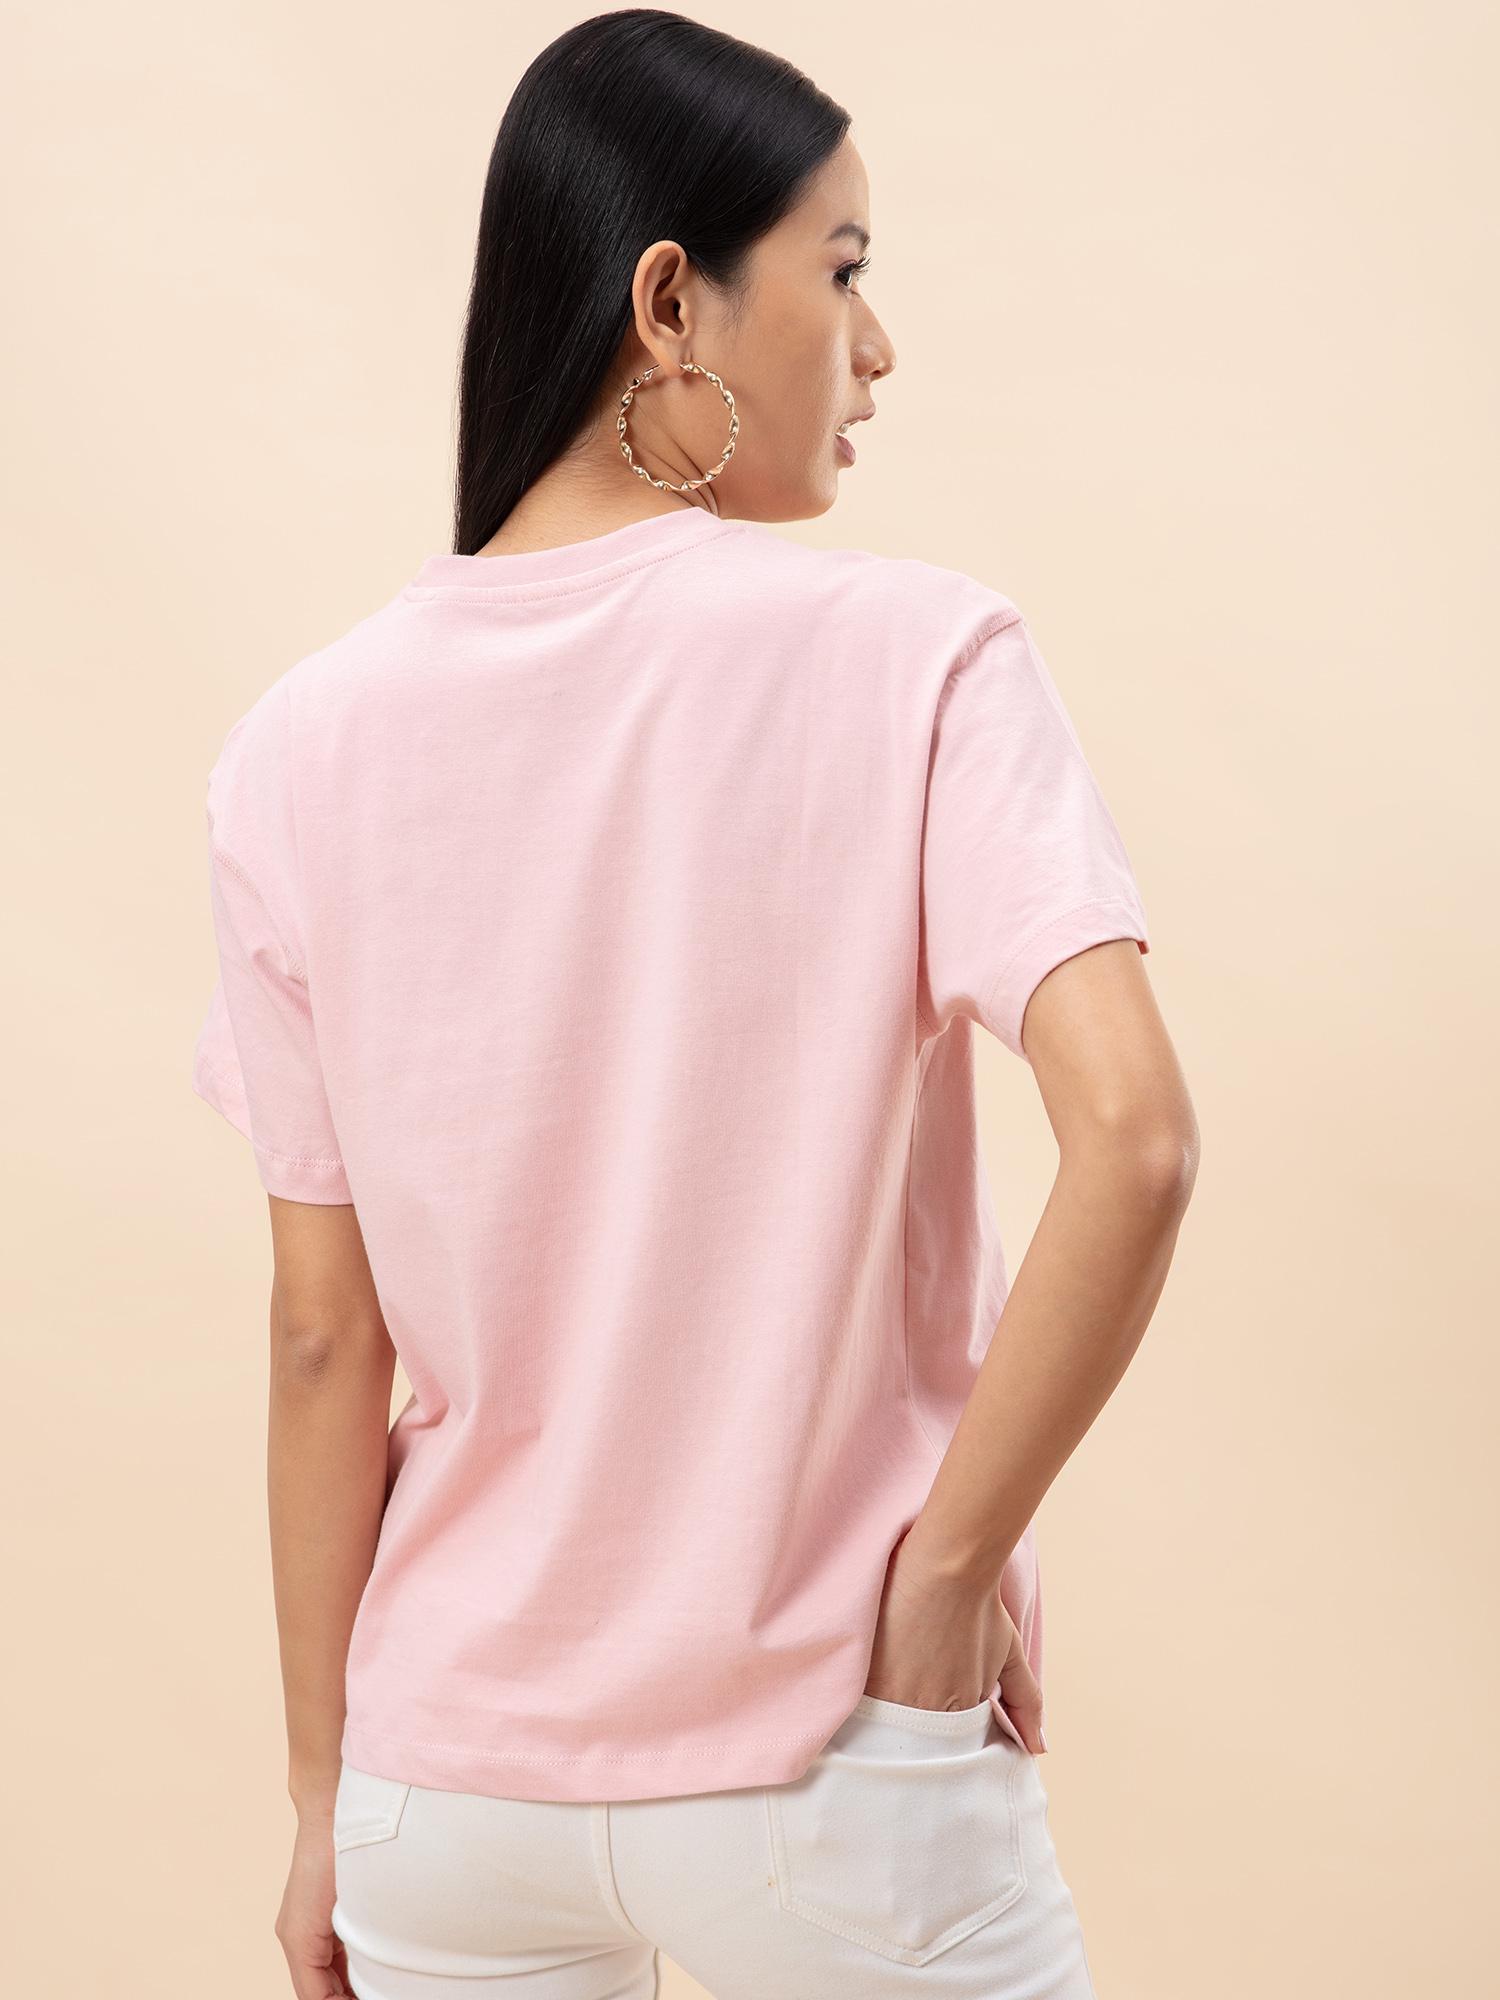 Tops-Oversized Love Dusky Pink T-shirt3